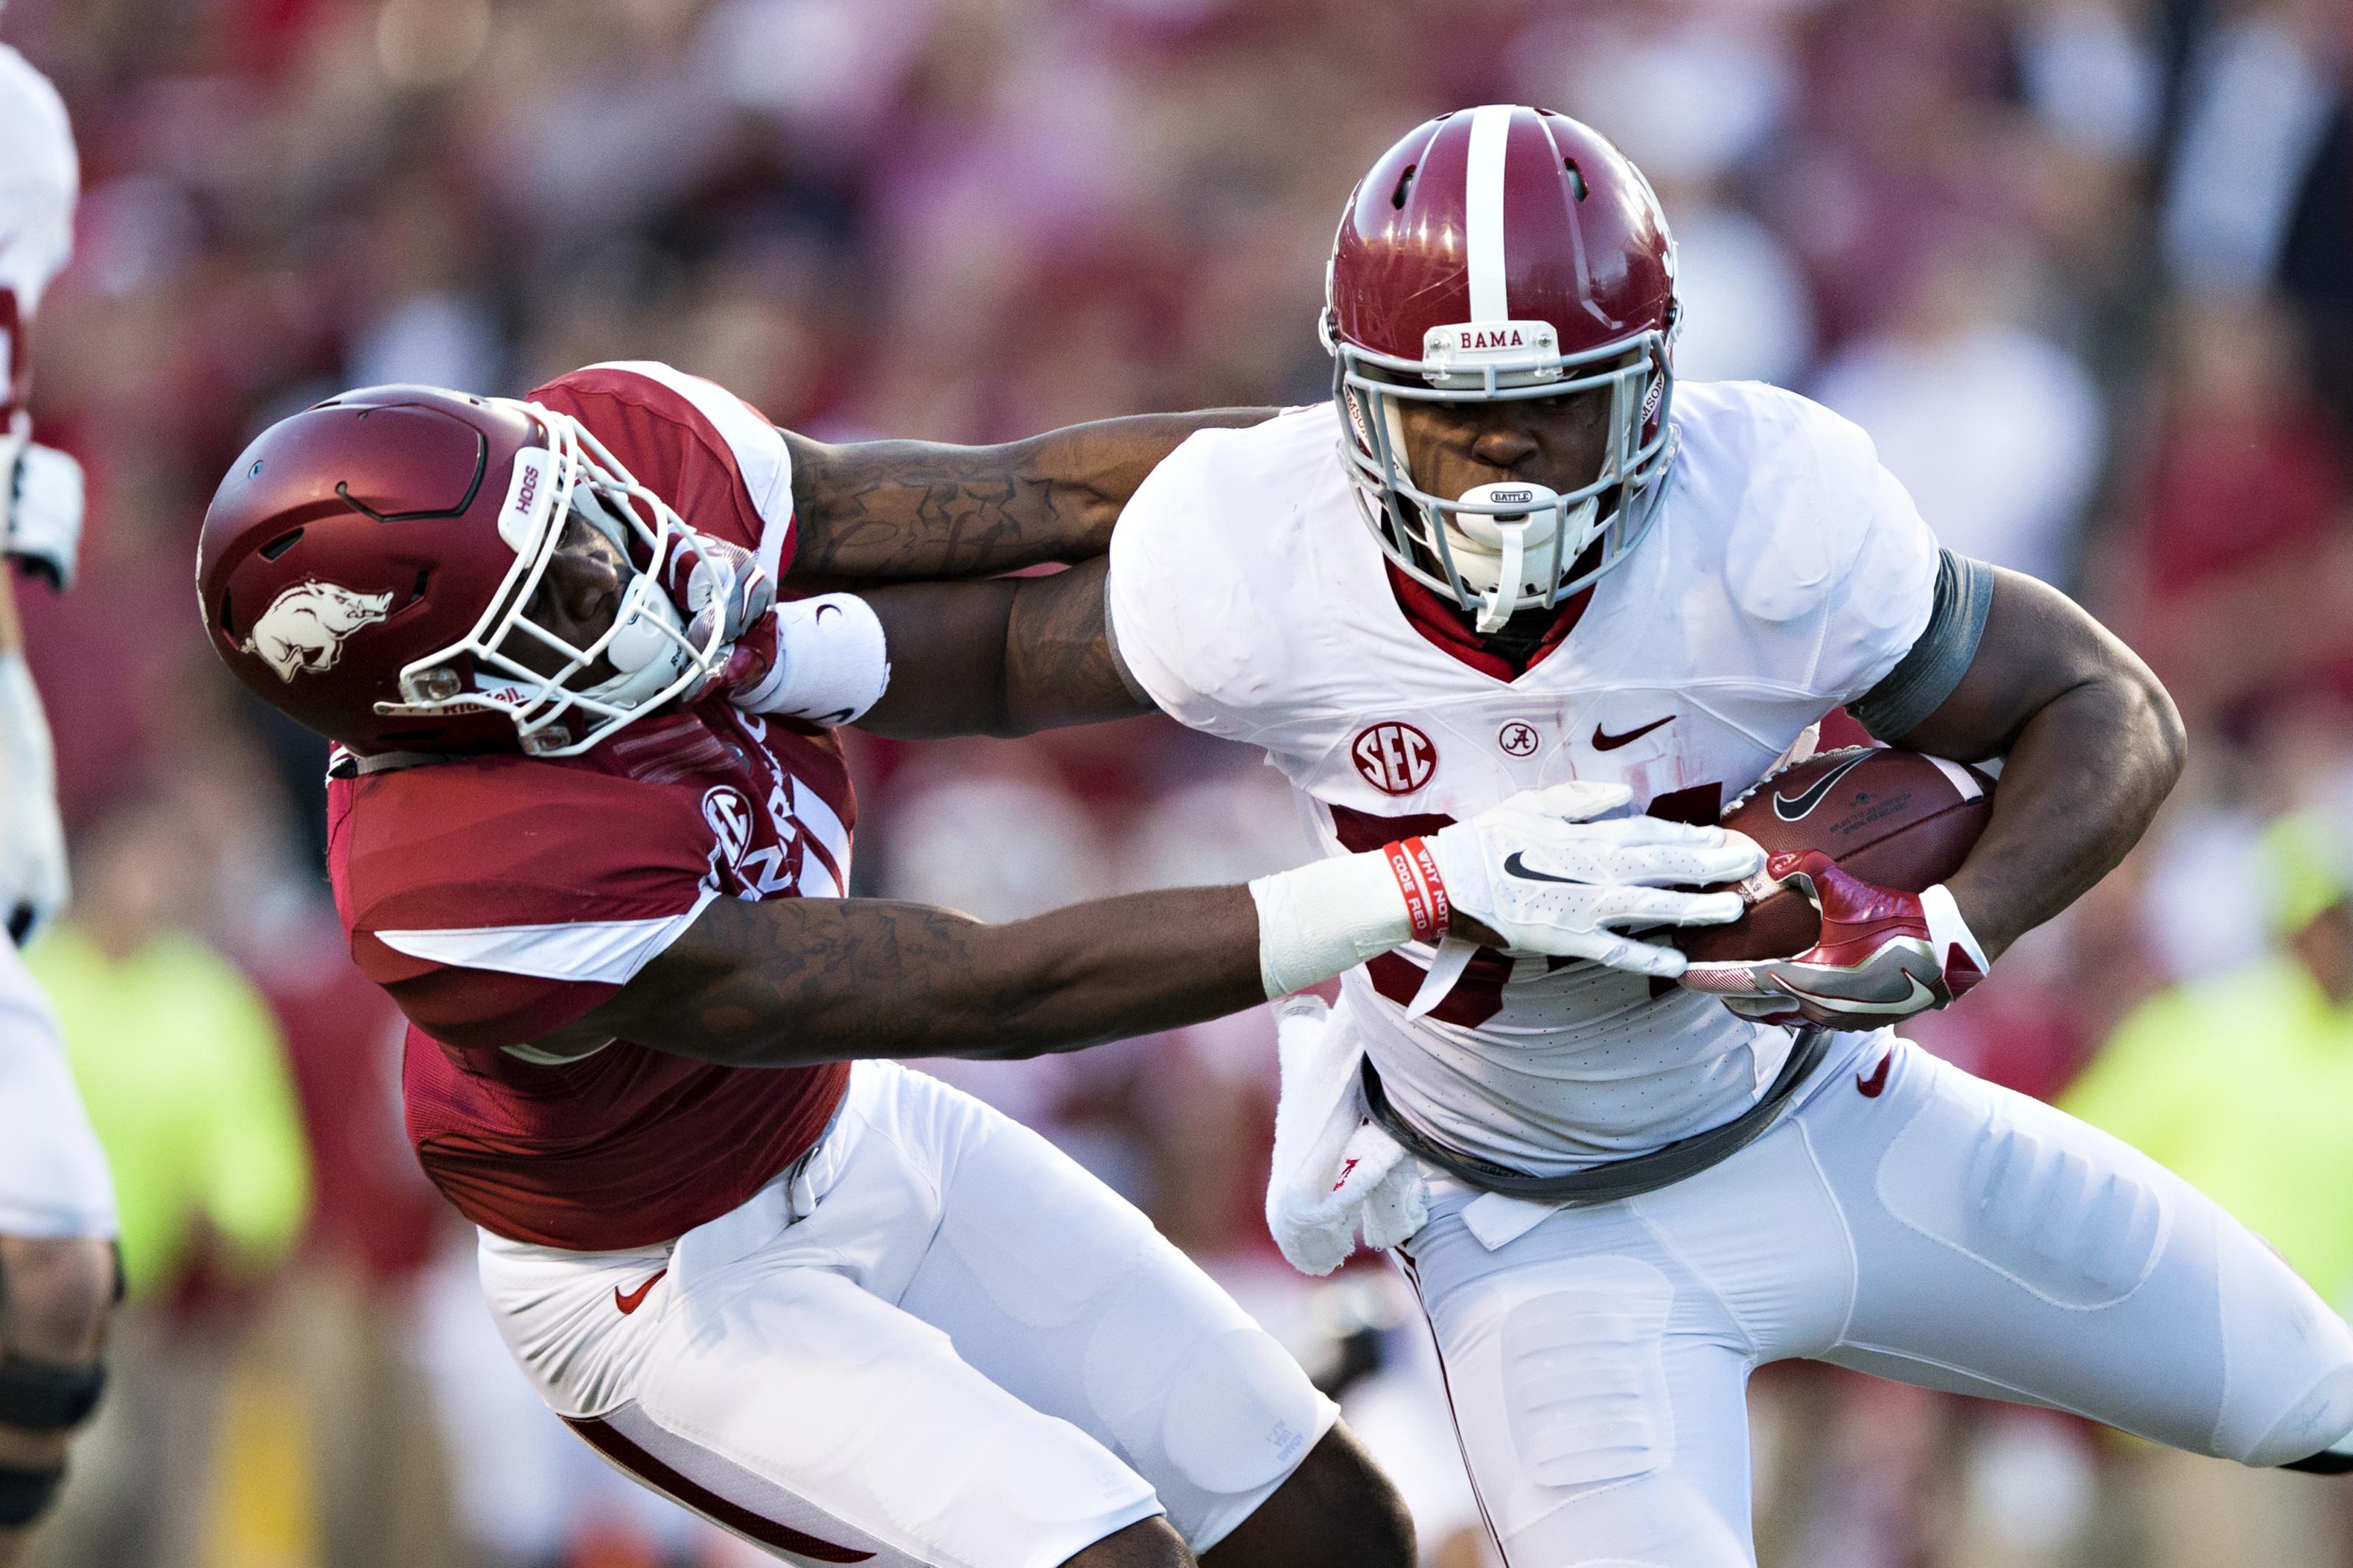 Nfl Draft 2019 Alabama S Damien Harris Is More Than Committee Back